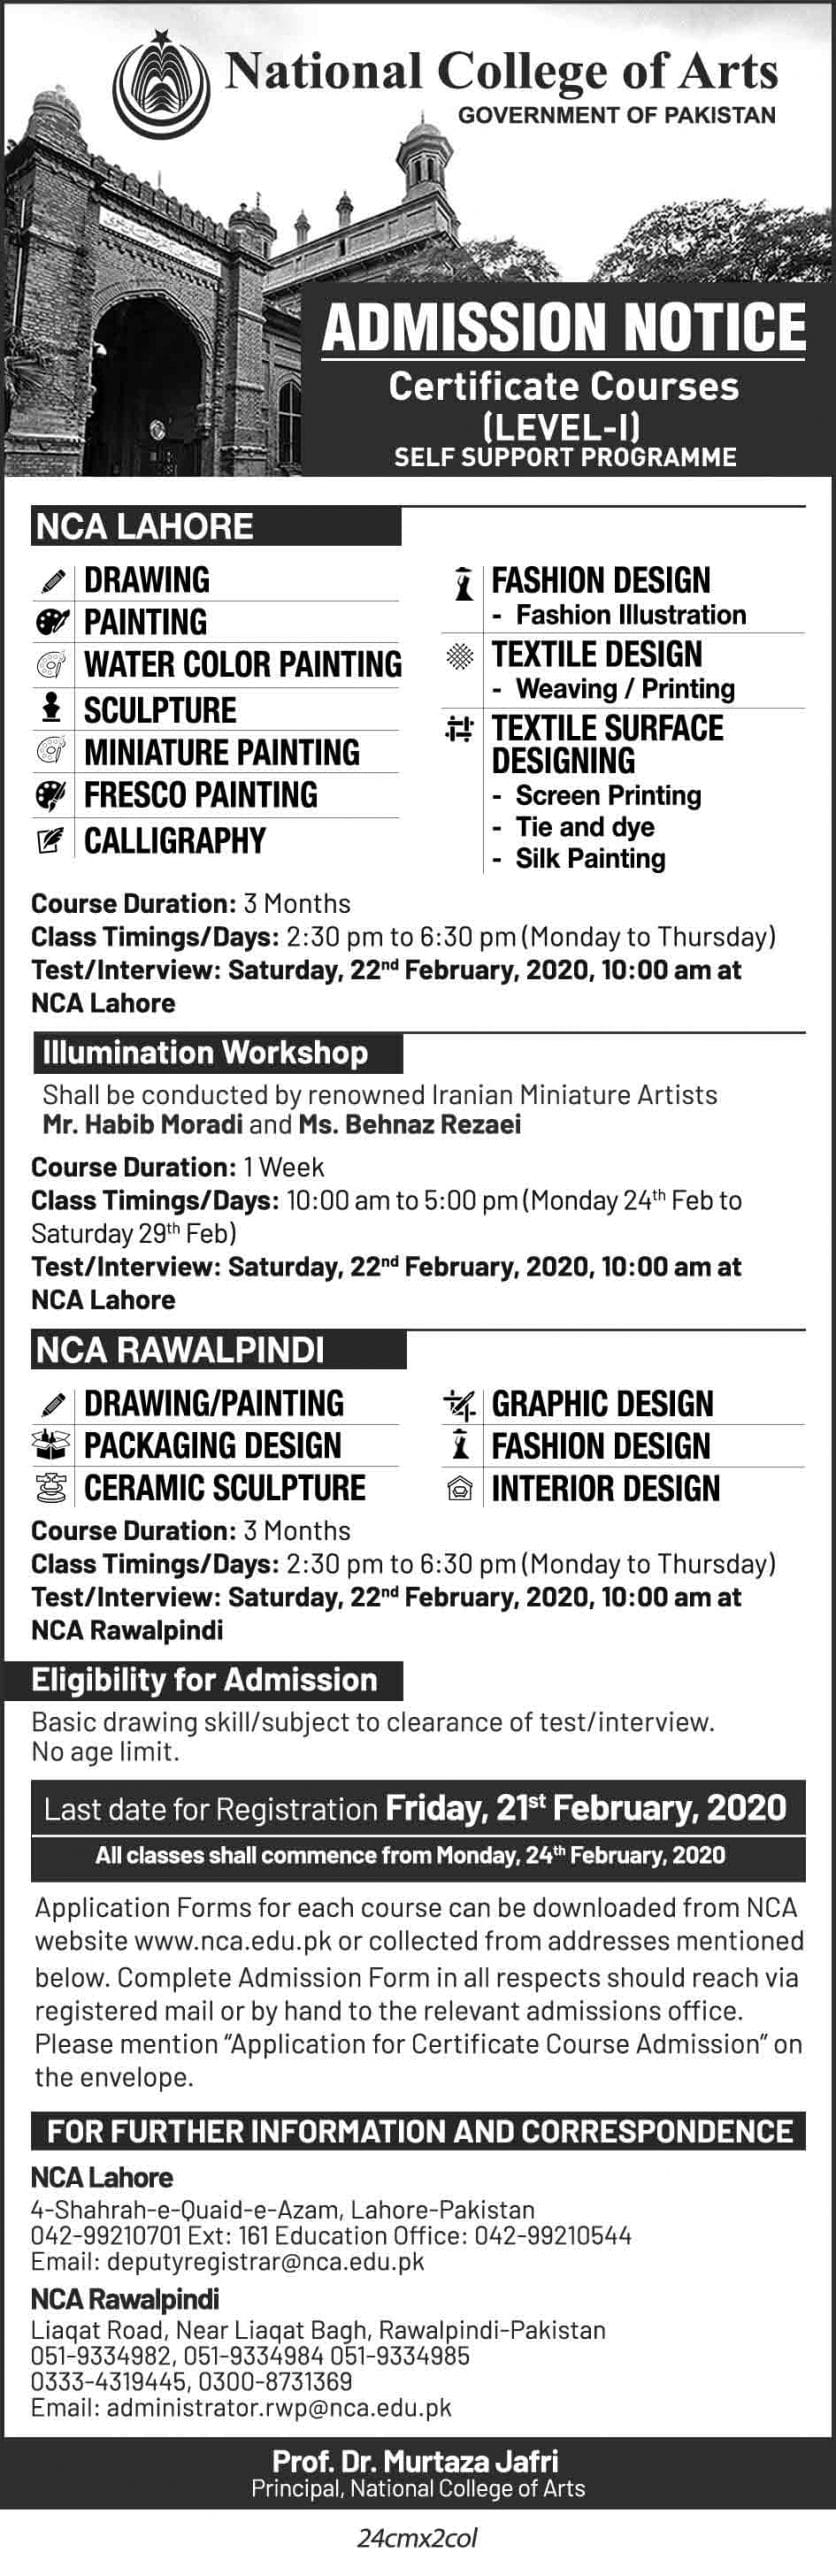 NCA-Lahore-Rawalpindi-Admission-2020-Last-Date